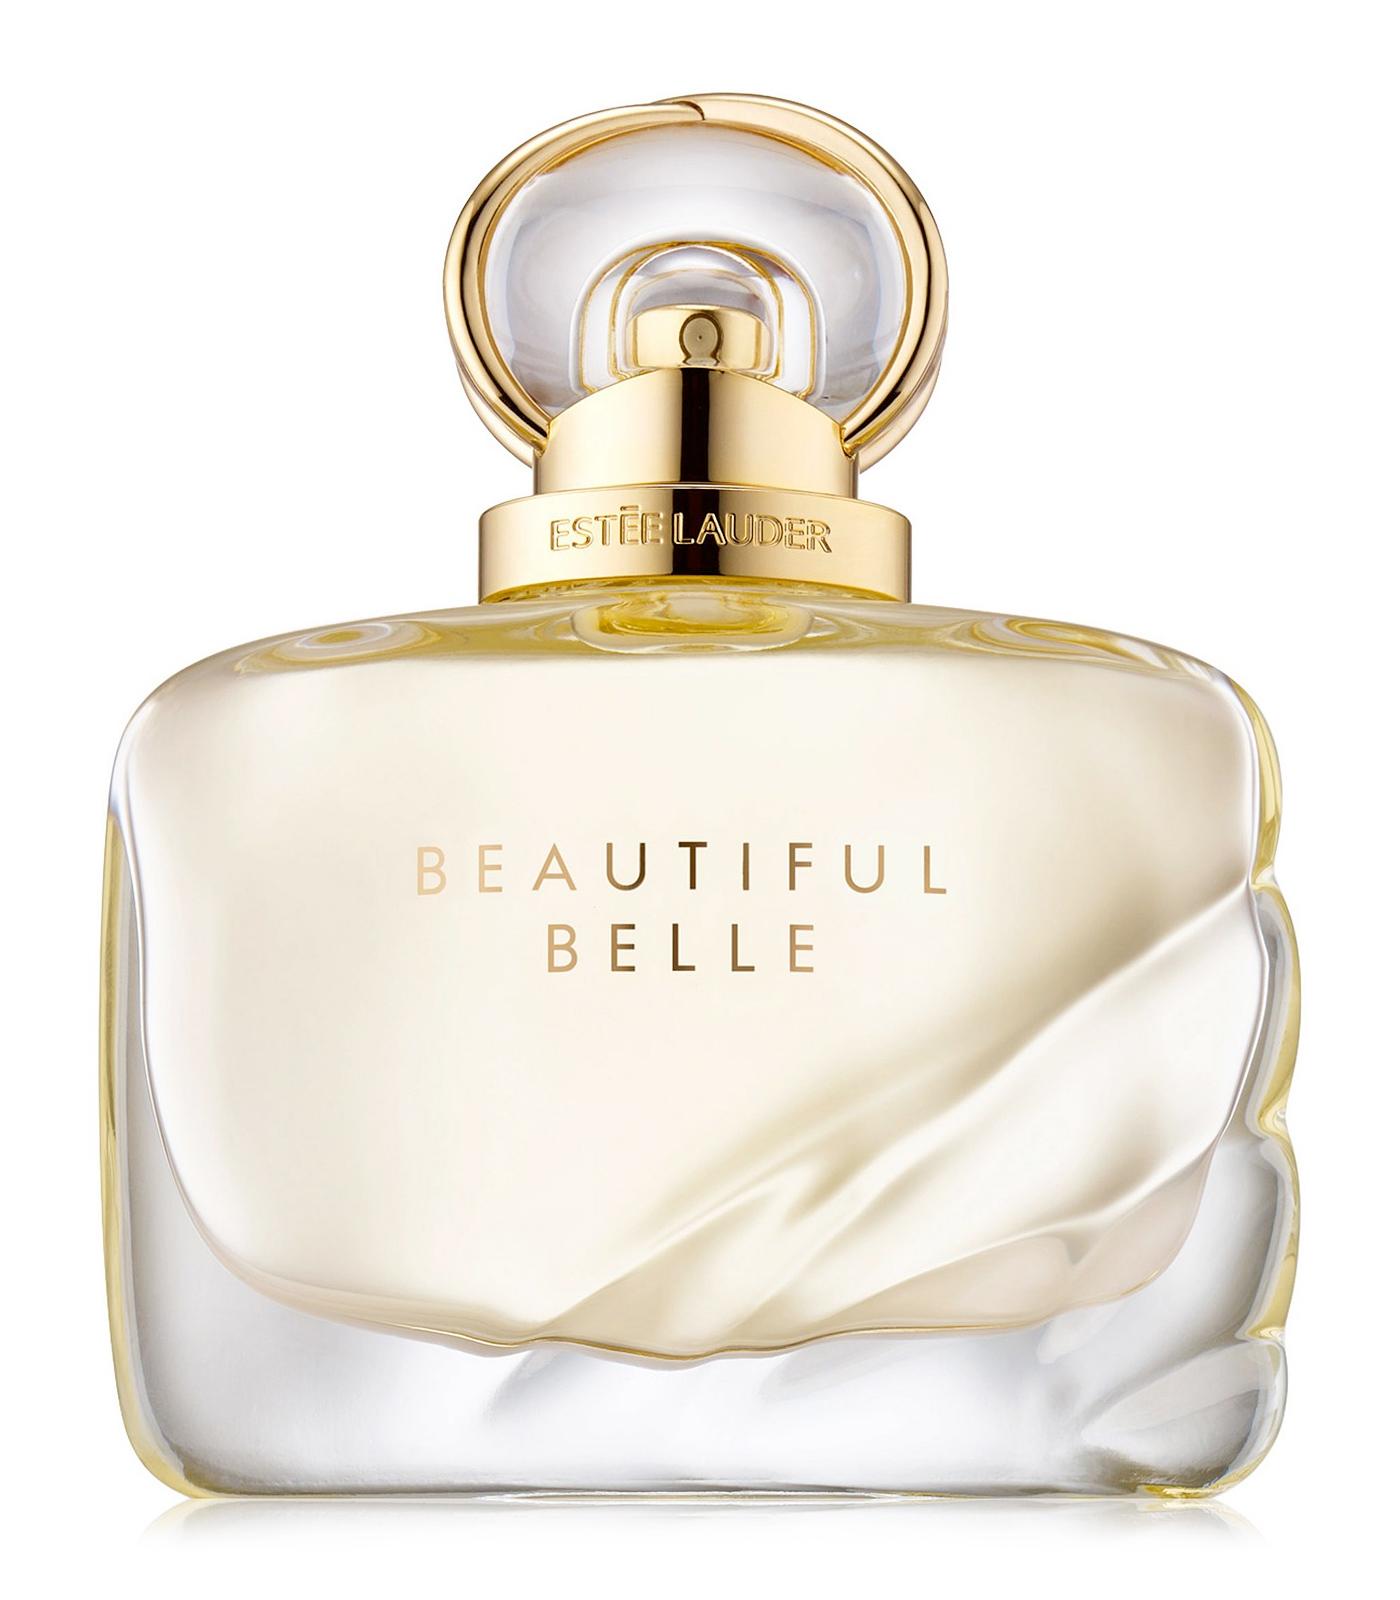 Beautiful Belle Este Lauder Perfume A New Fragrance For Women 2018 Estee Pleasures Intense Edp 100ml